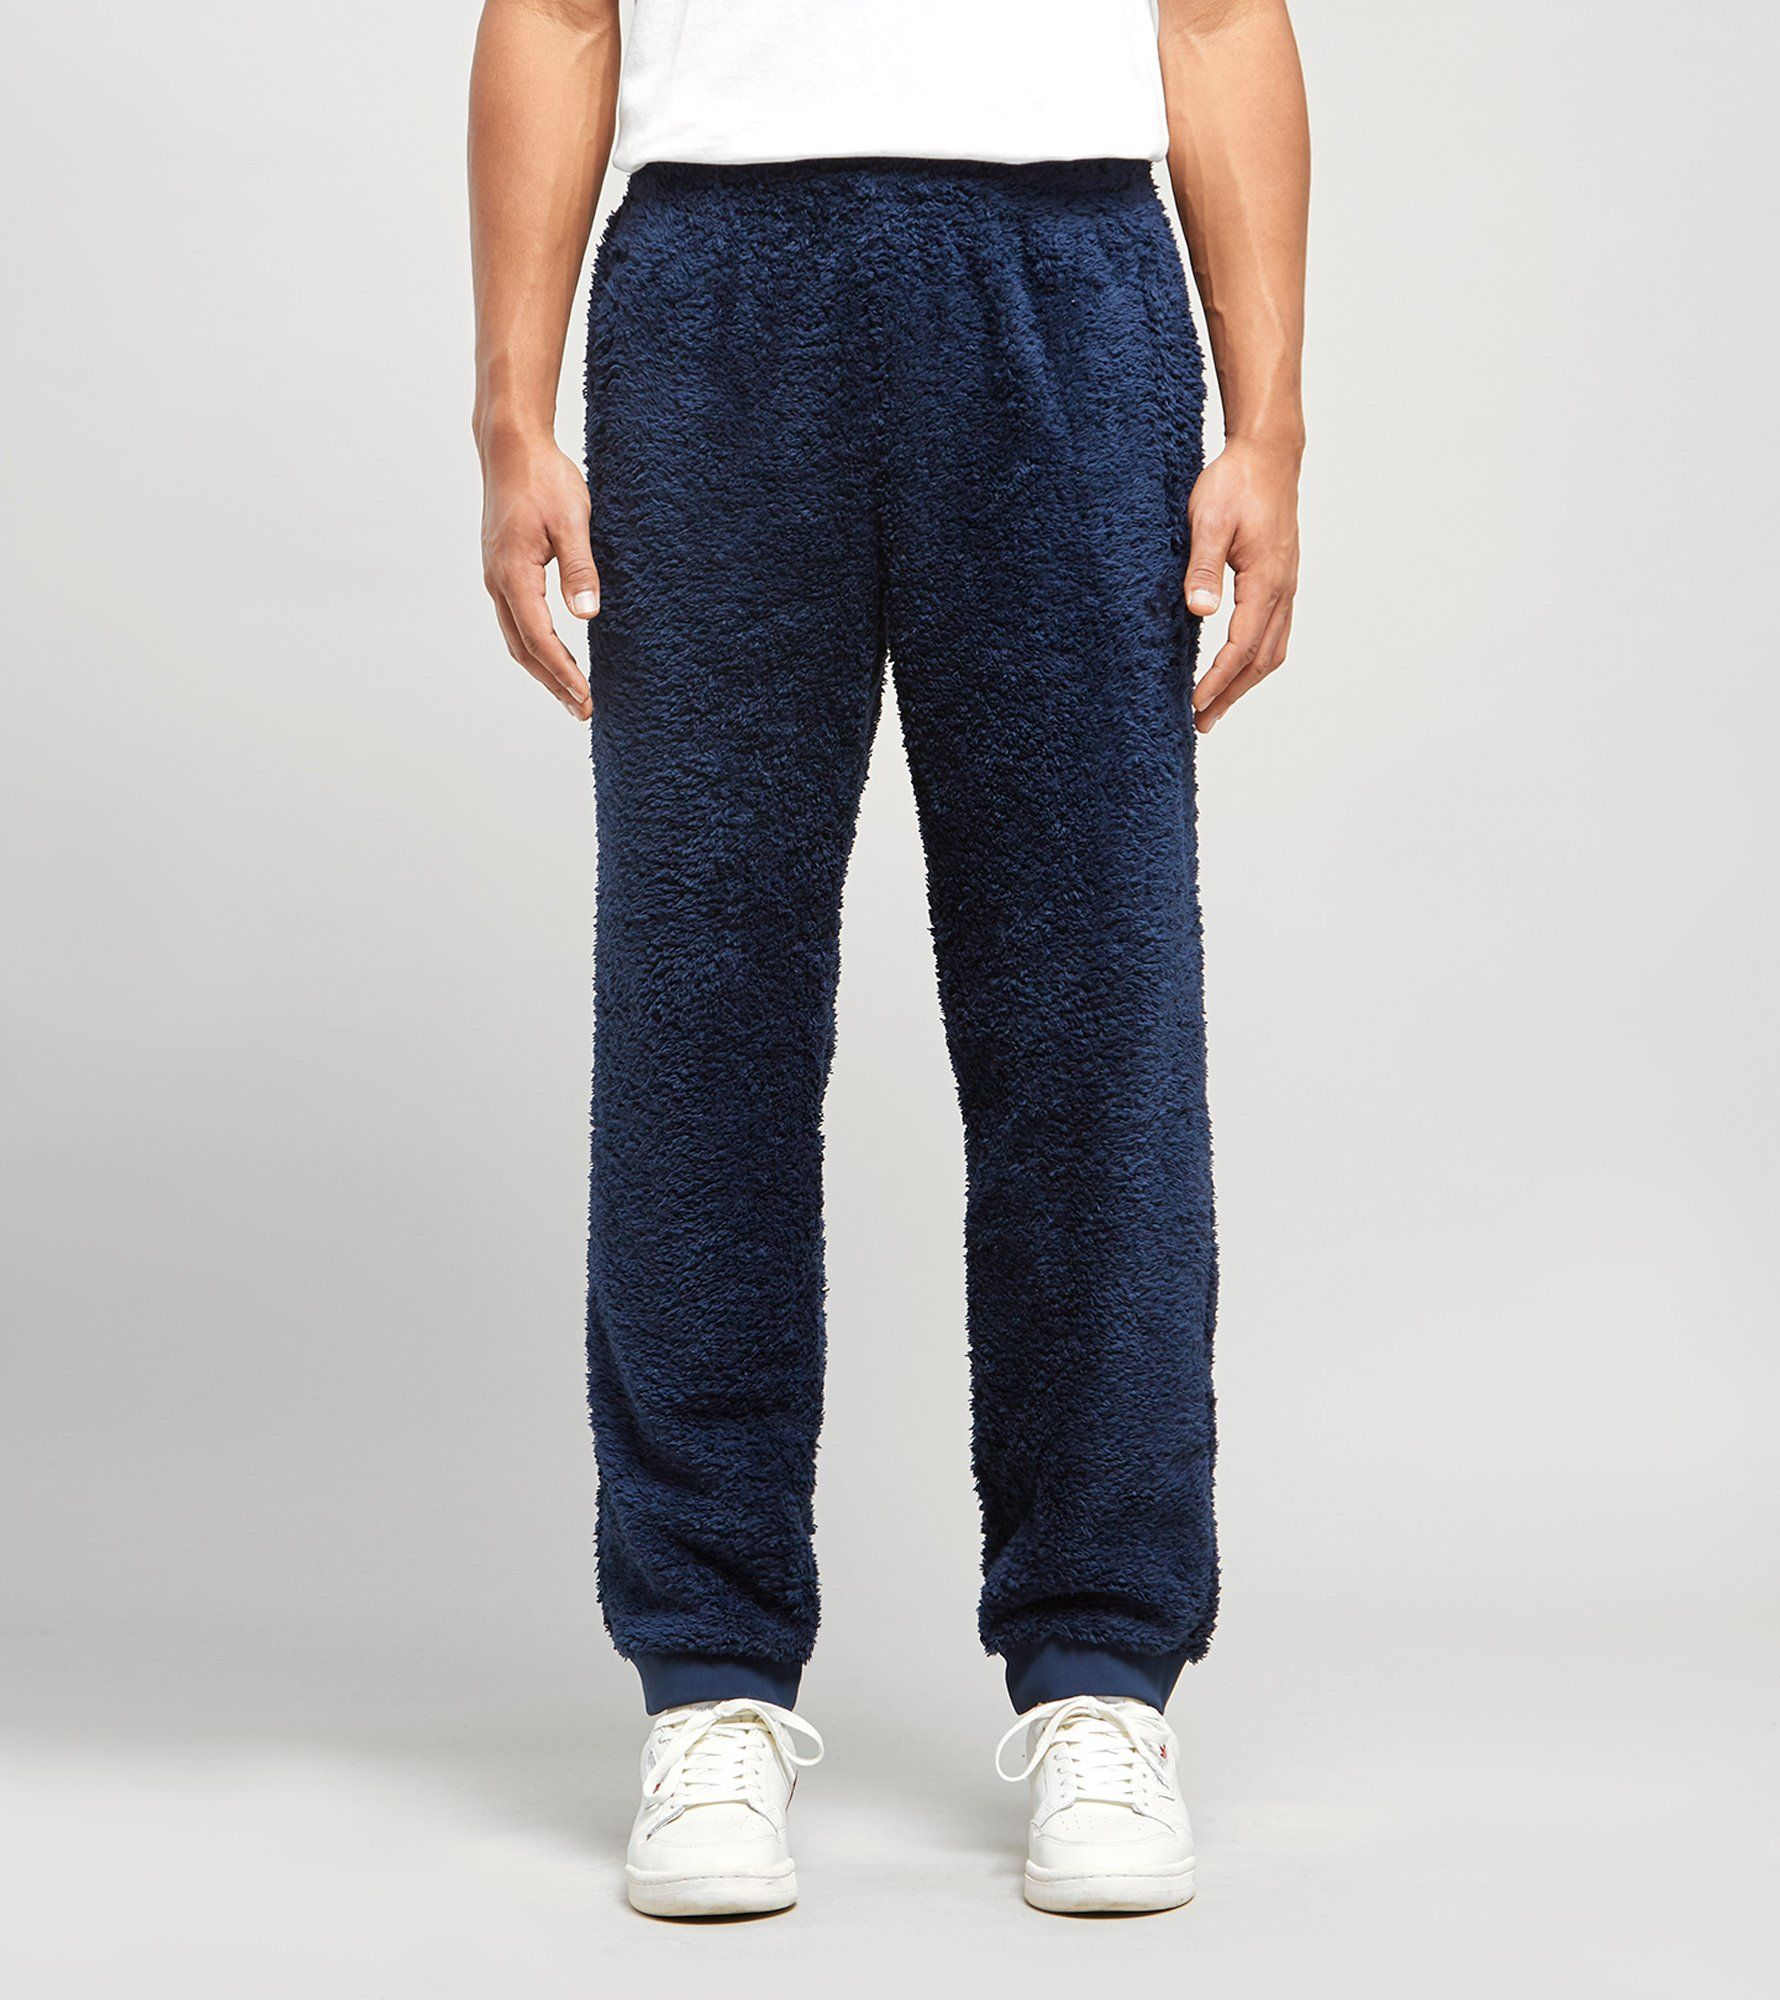 adidas Originals Polar Fleece Pant